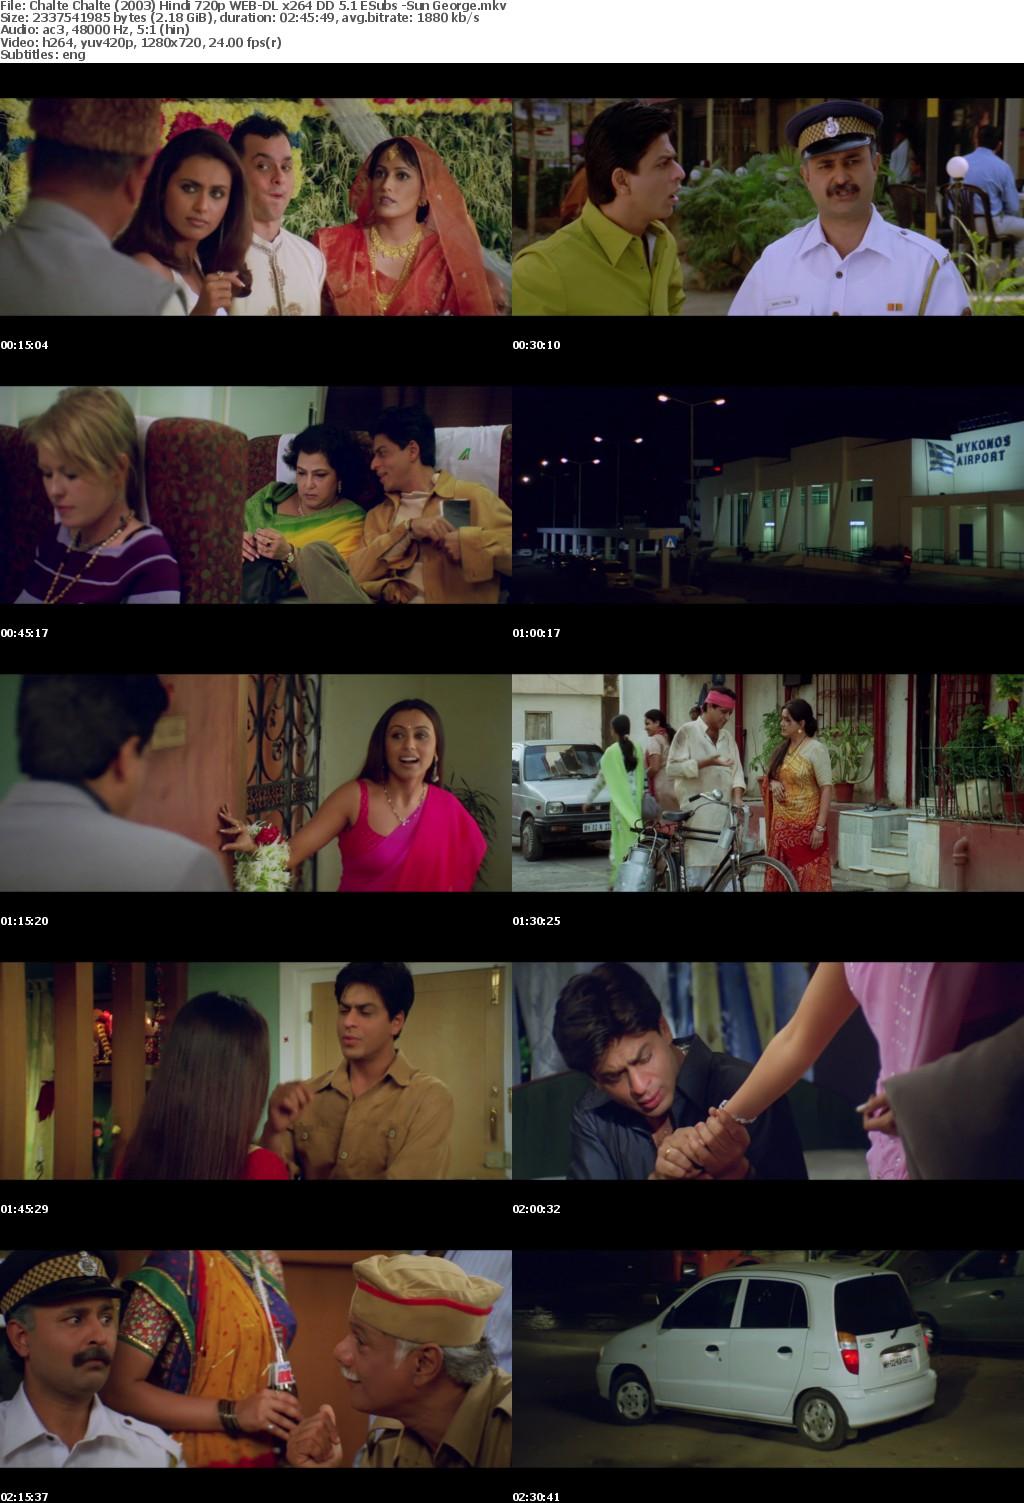 Chalte Chalte (2003) Hindi 720p WEB-DL x264 DD 5.1 ESubs -Sun George